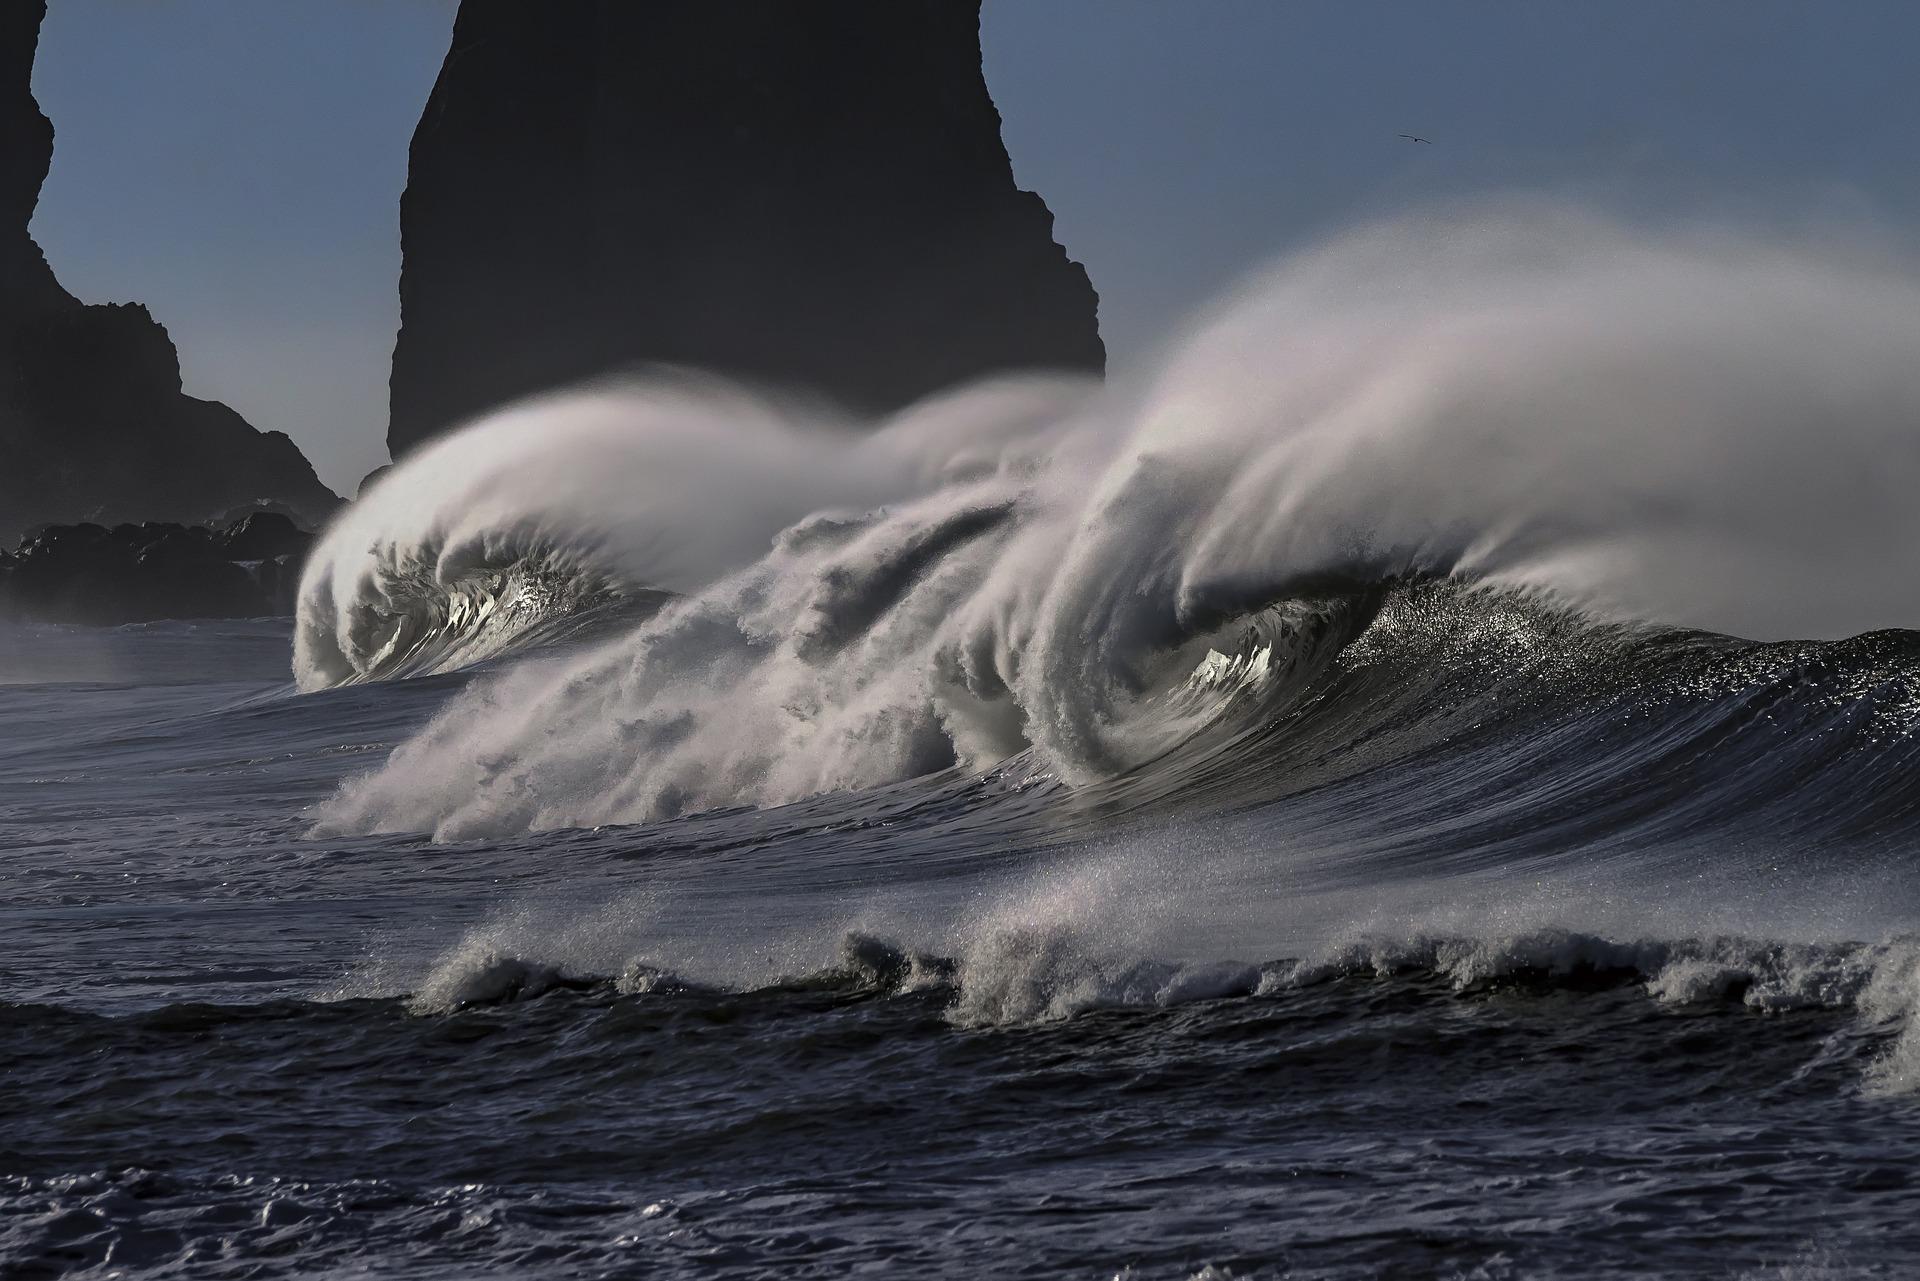 wave-2089959_1920